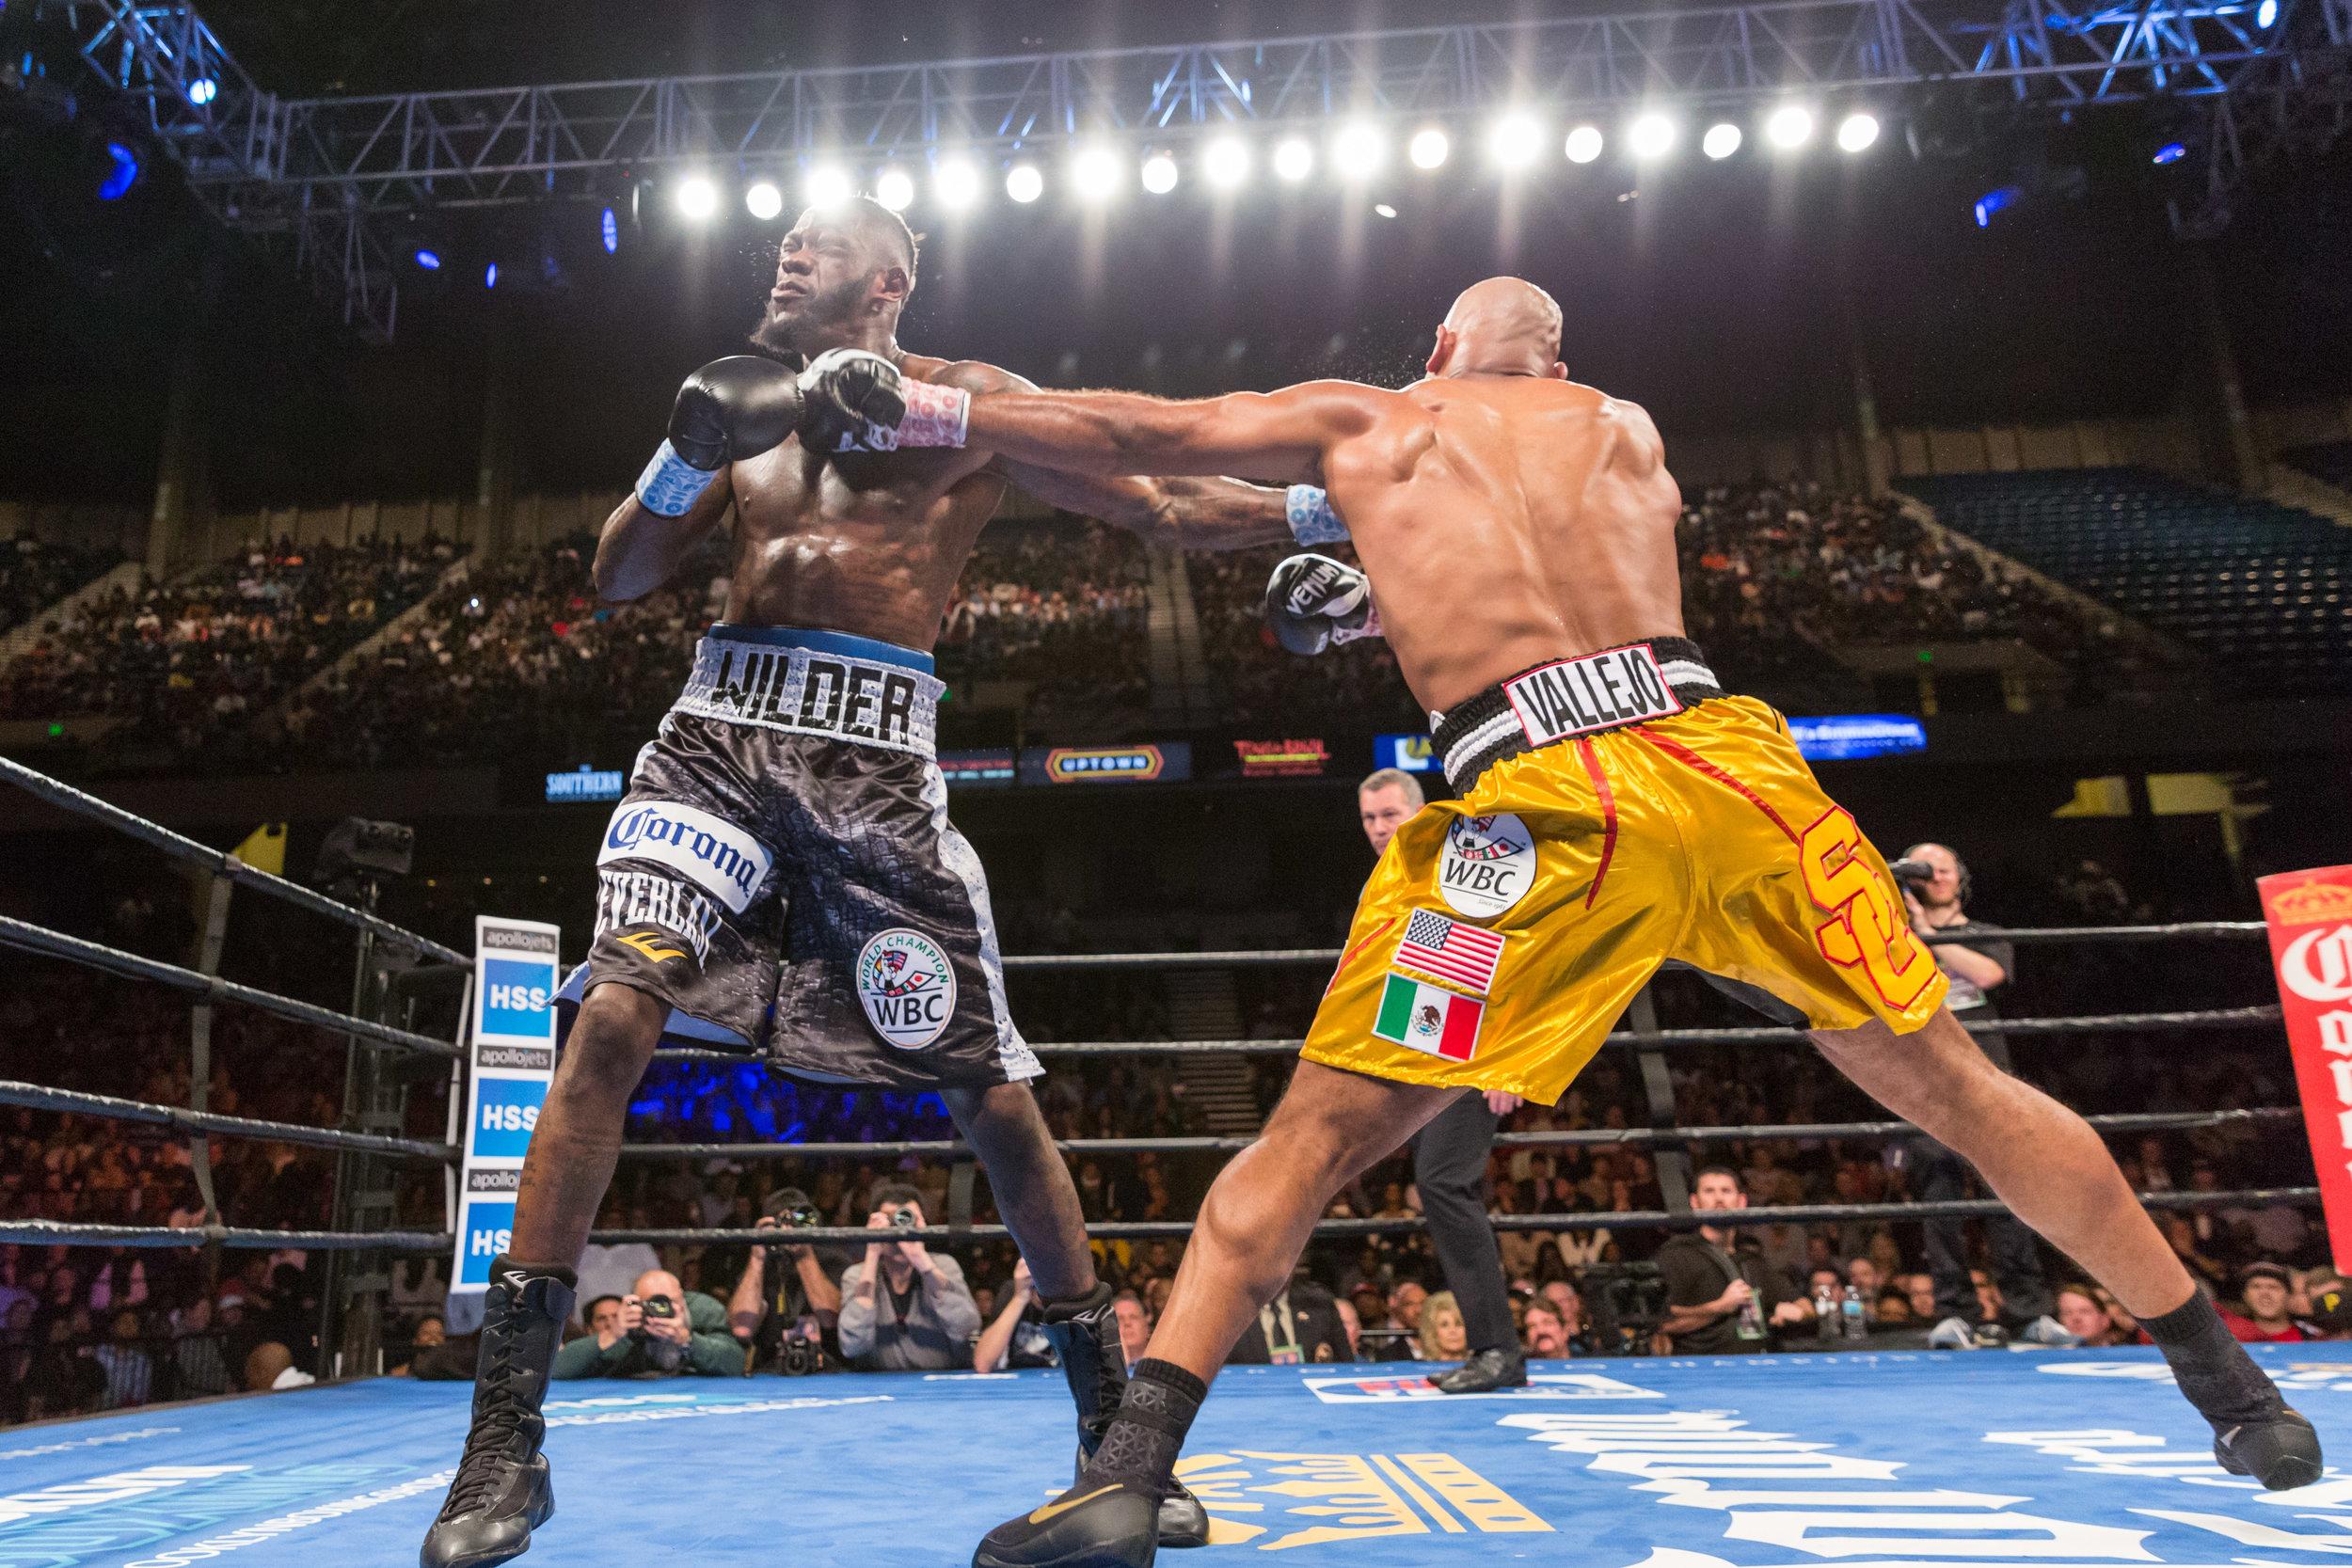 Deontay Wilder vs Gerald Washington - February 25_ 2017_02_25_2017_Fight_Ryan Hafey _ Premier Boxing Champions9.jpg